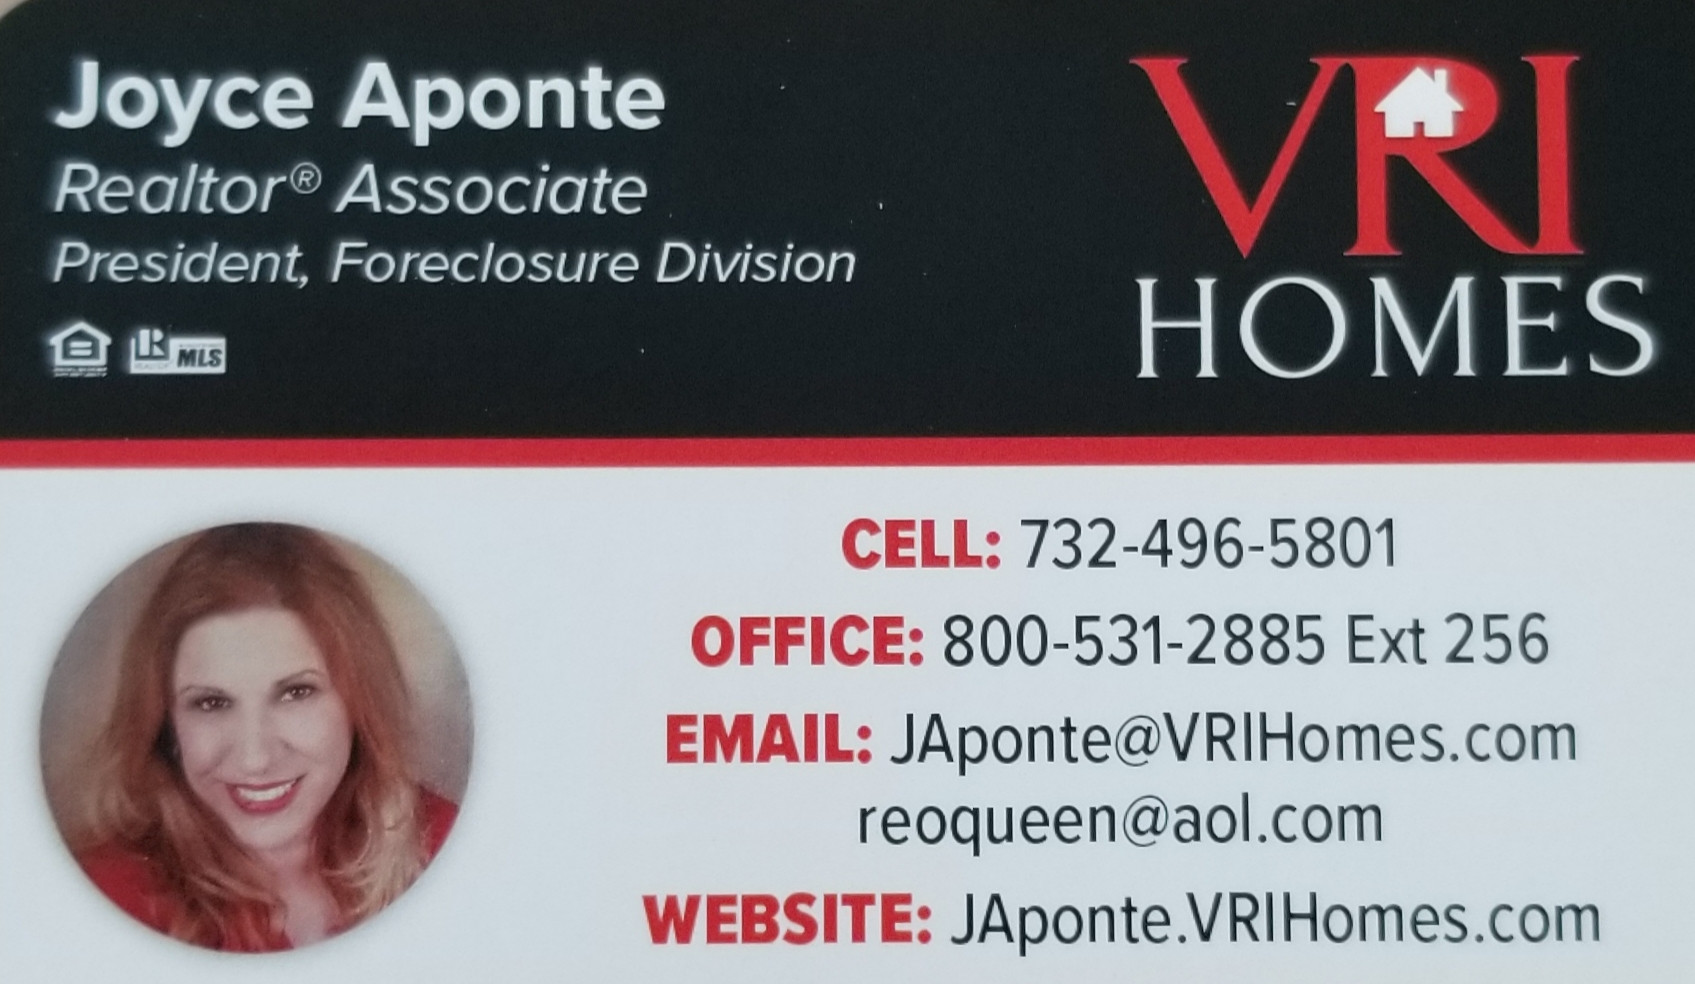 Joyce full Business Card.jpg